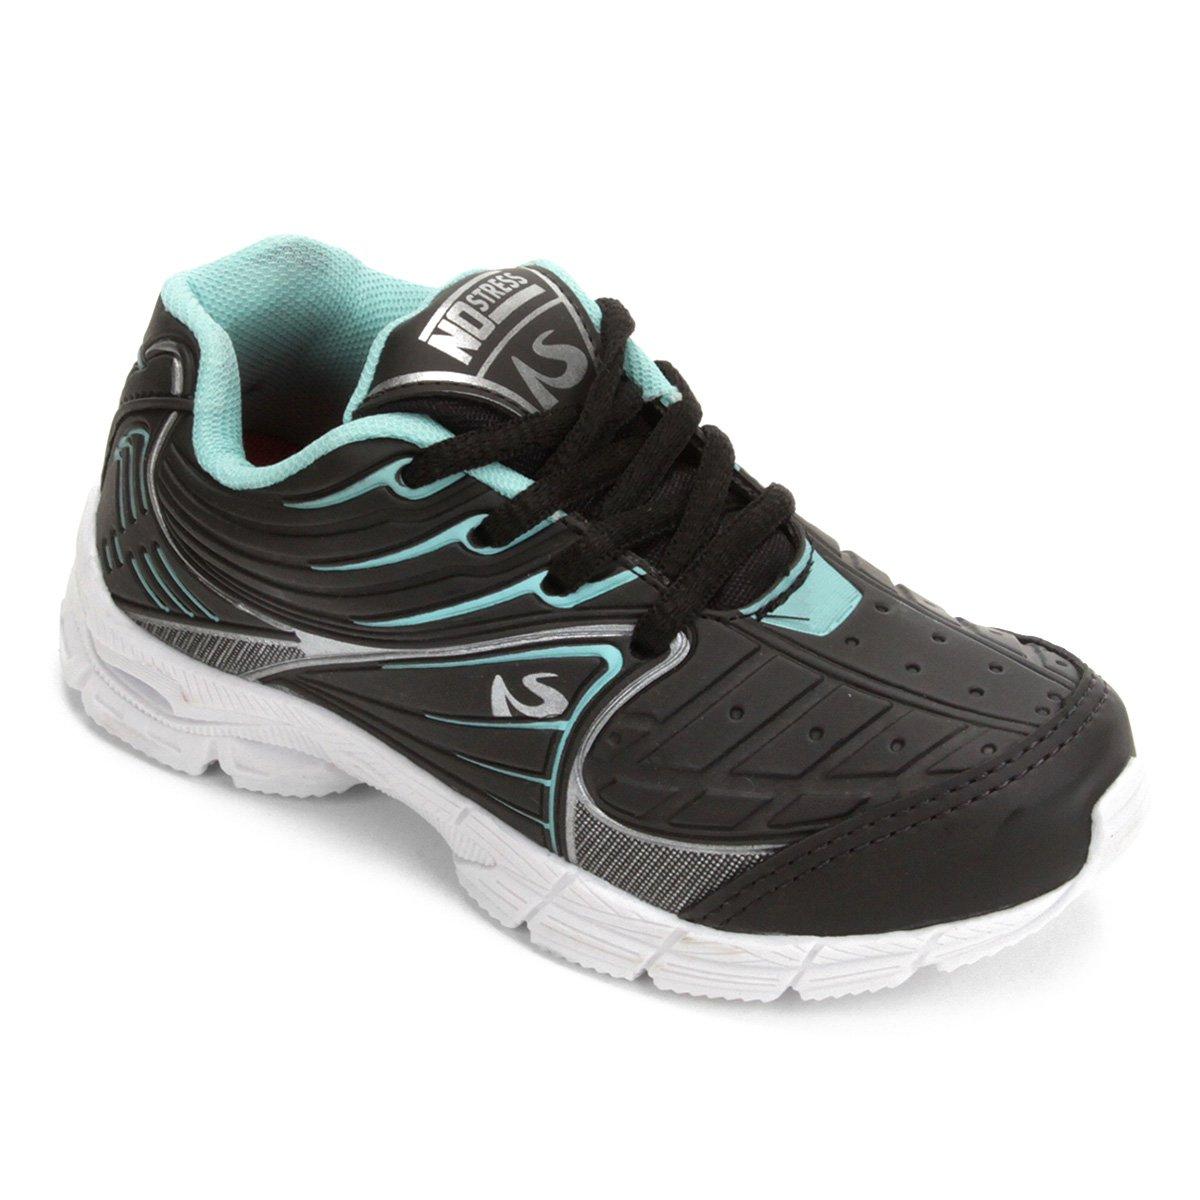 70d8d8d88c4 Tênis Infantil No Stress Jogging Masculino - Preto e verde - Compre Agora